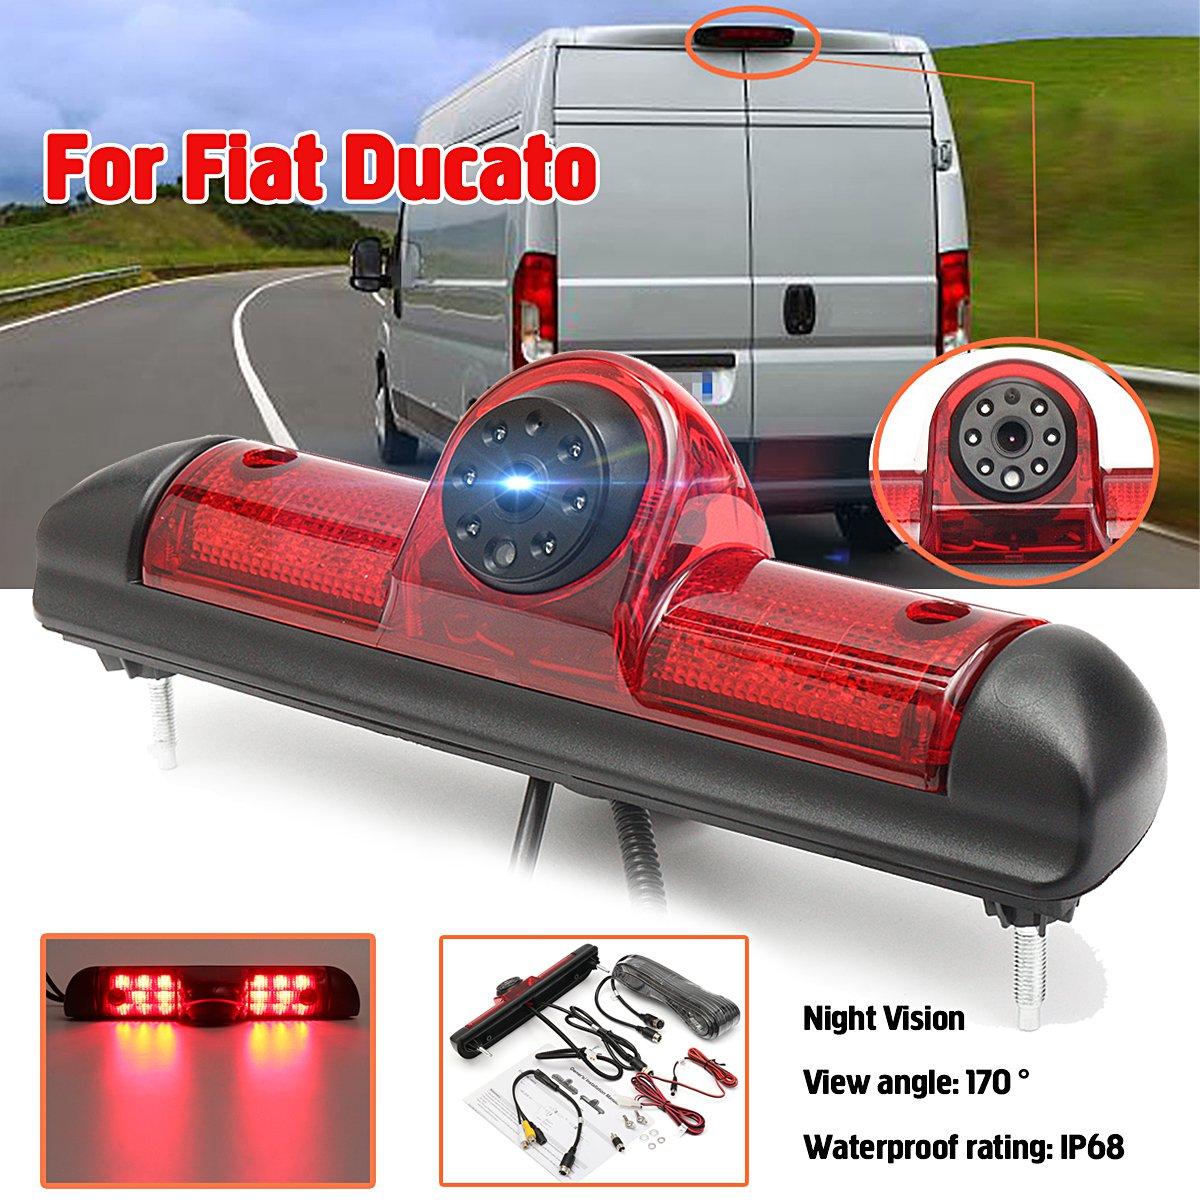 HD CCD Car Rear View Camera Reversing Backup Parking Brake Light Night Vision for Fiat Ducato late Peugeot Boxer Citroen Jumper